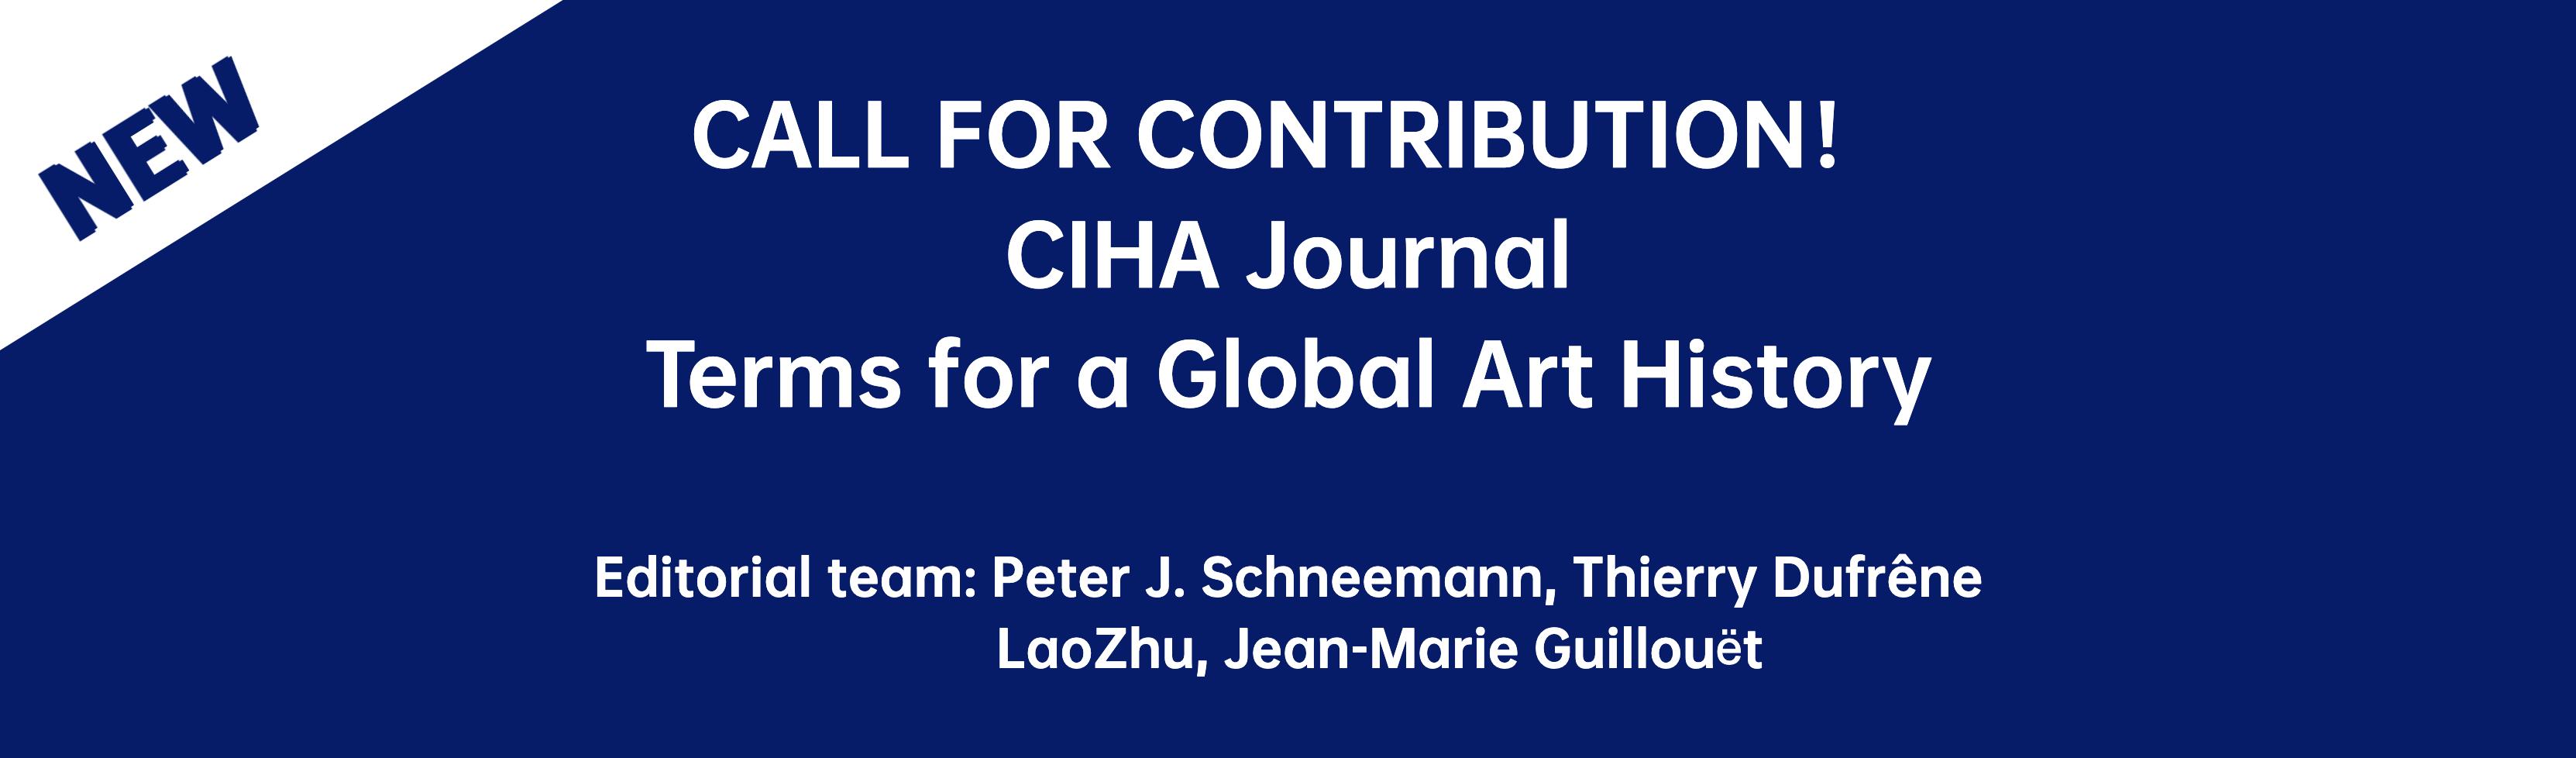 CALL FOR CONTRIBUTIONS - CIHA Journal